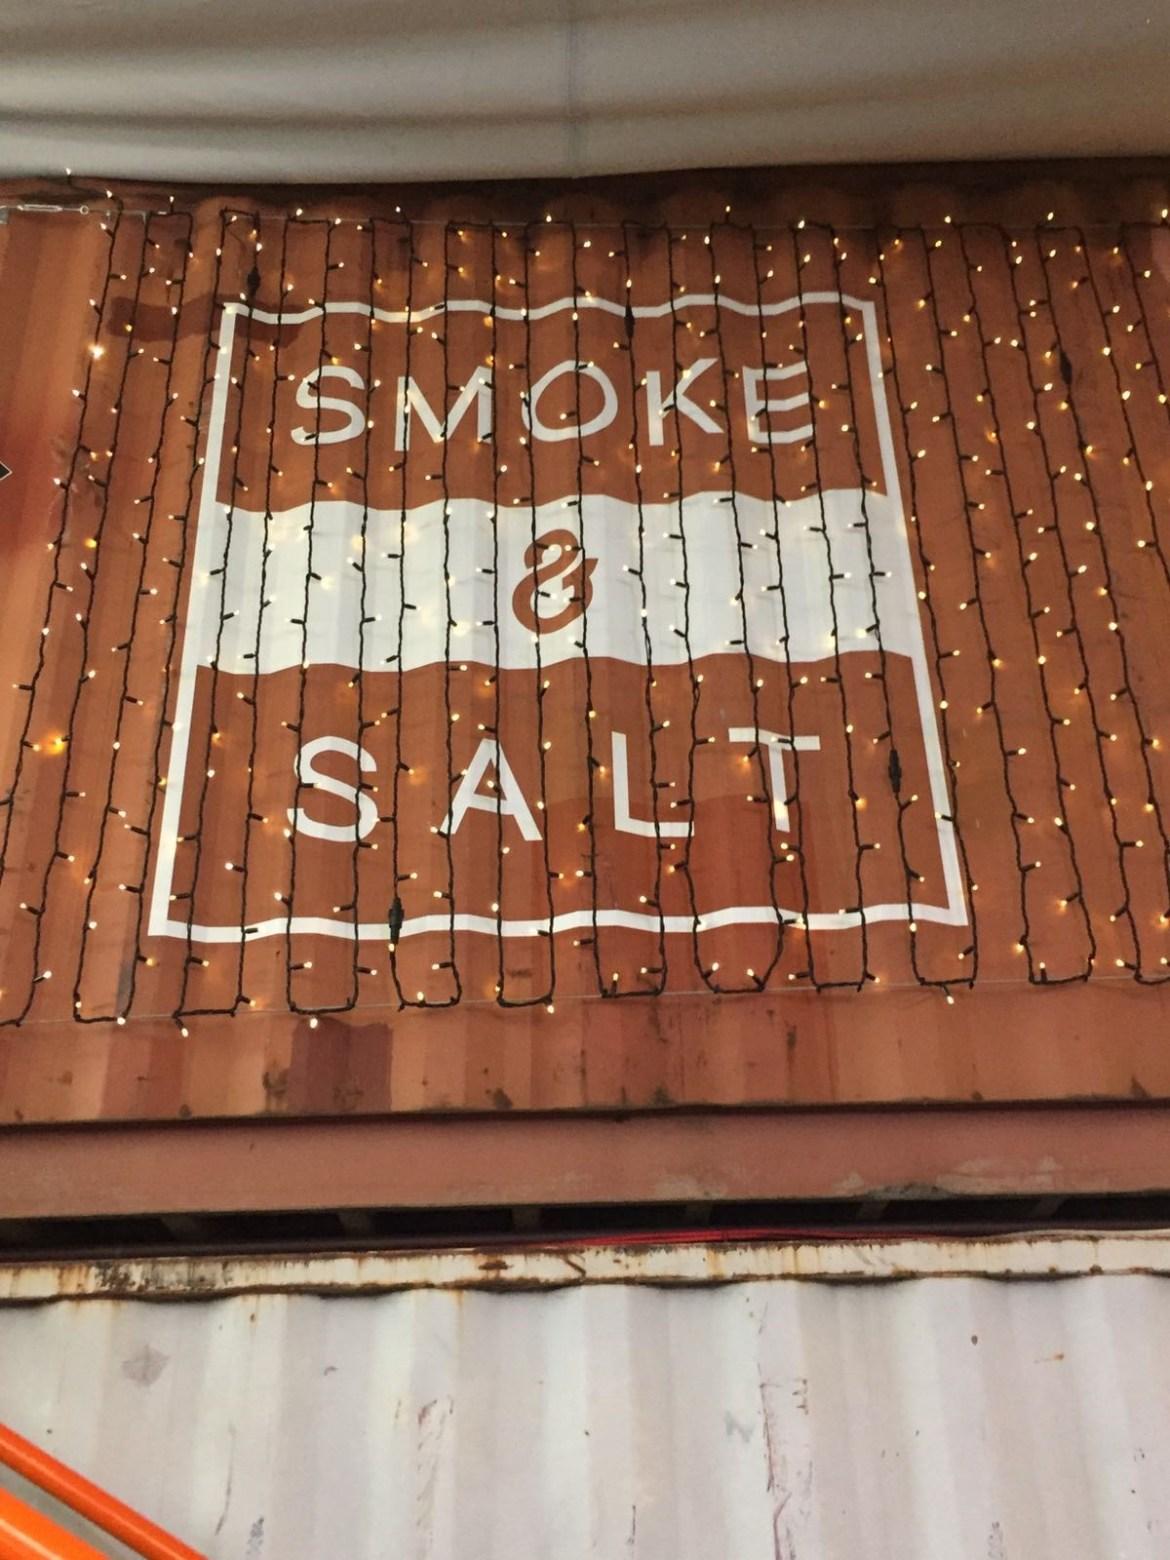 Smoke & salt